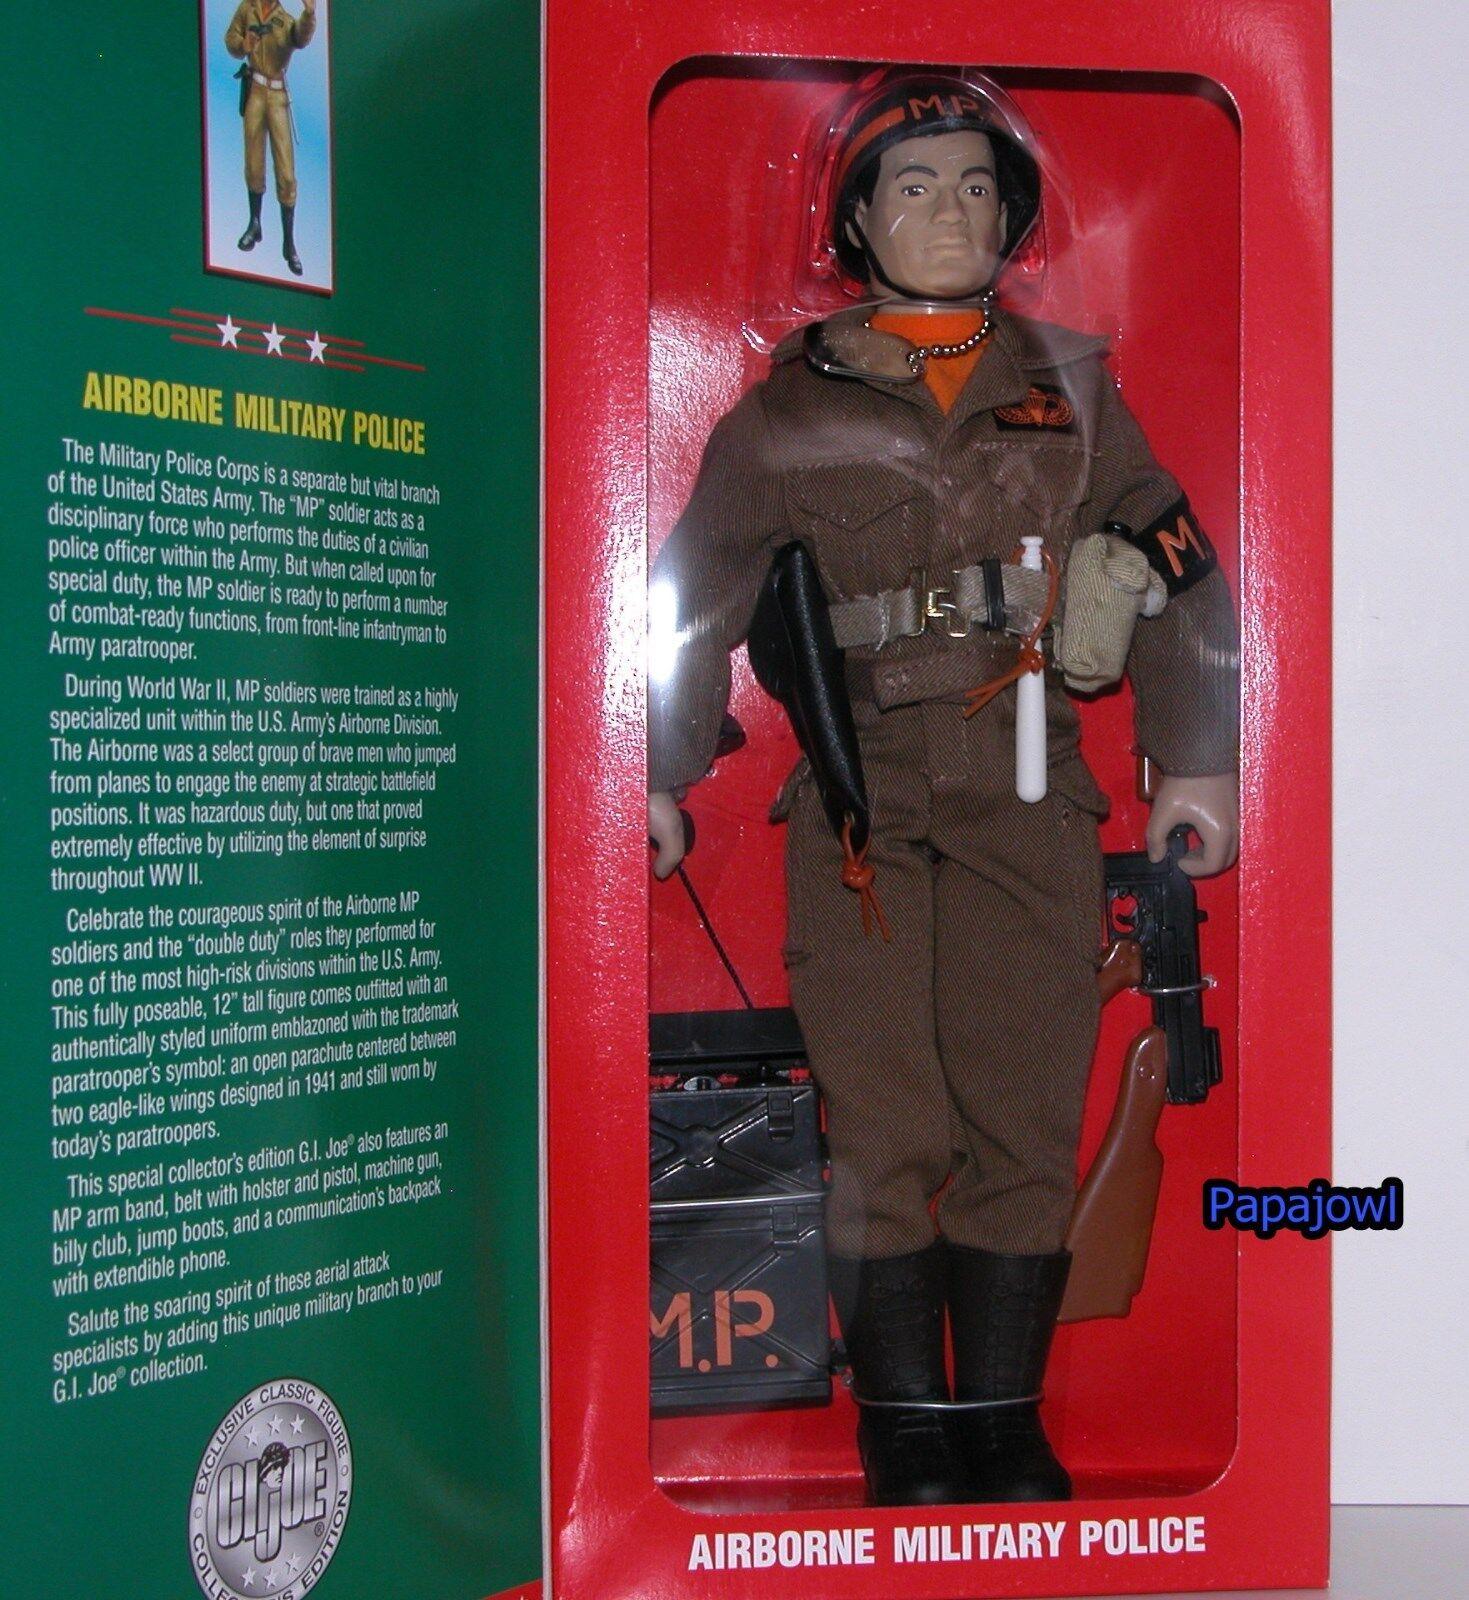 GI Joe US Airborn Military Police 12  Limited Edition Action Figure 1996